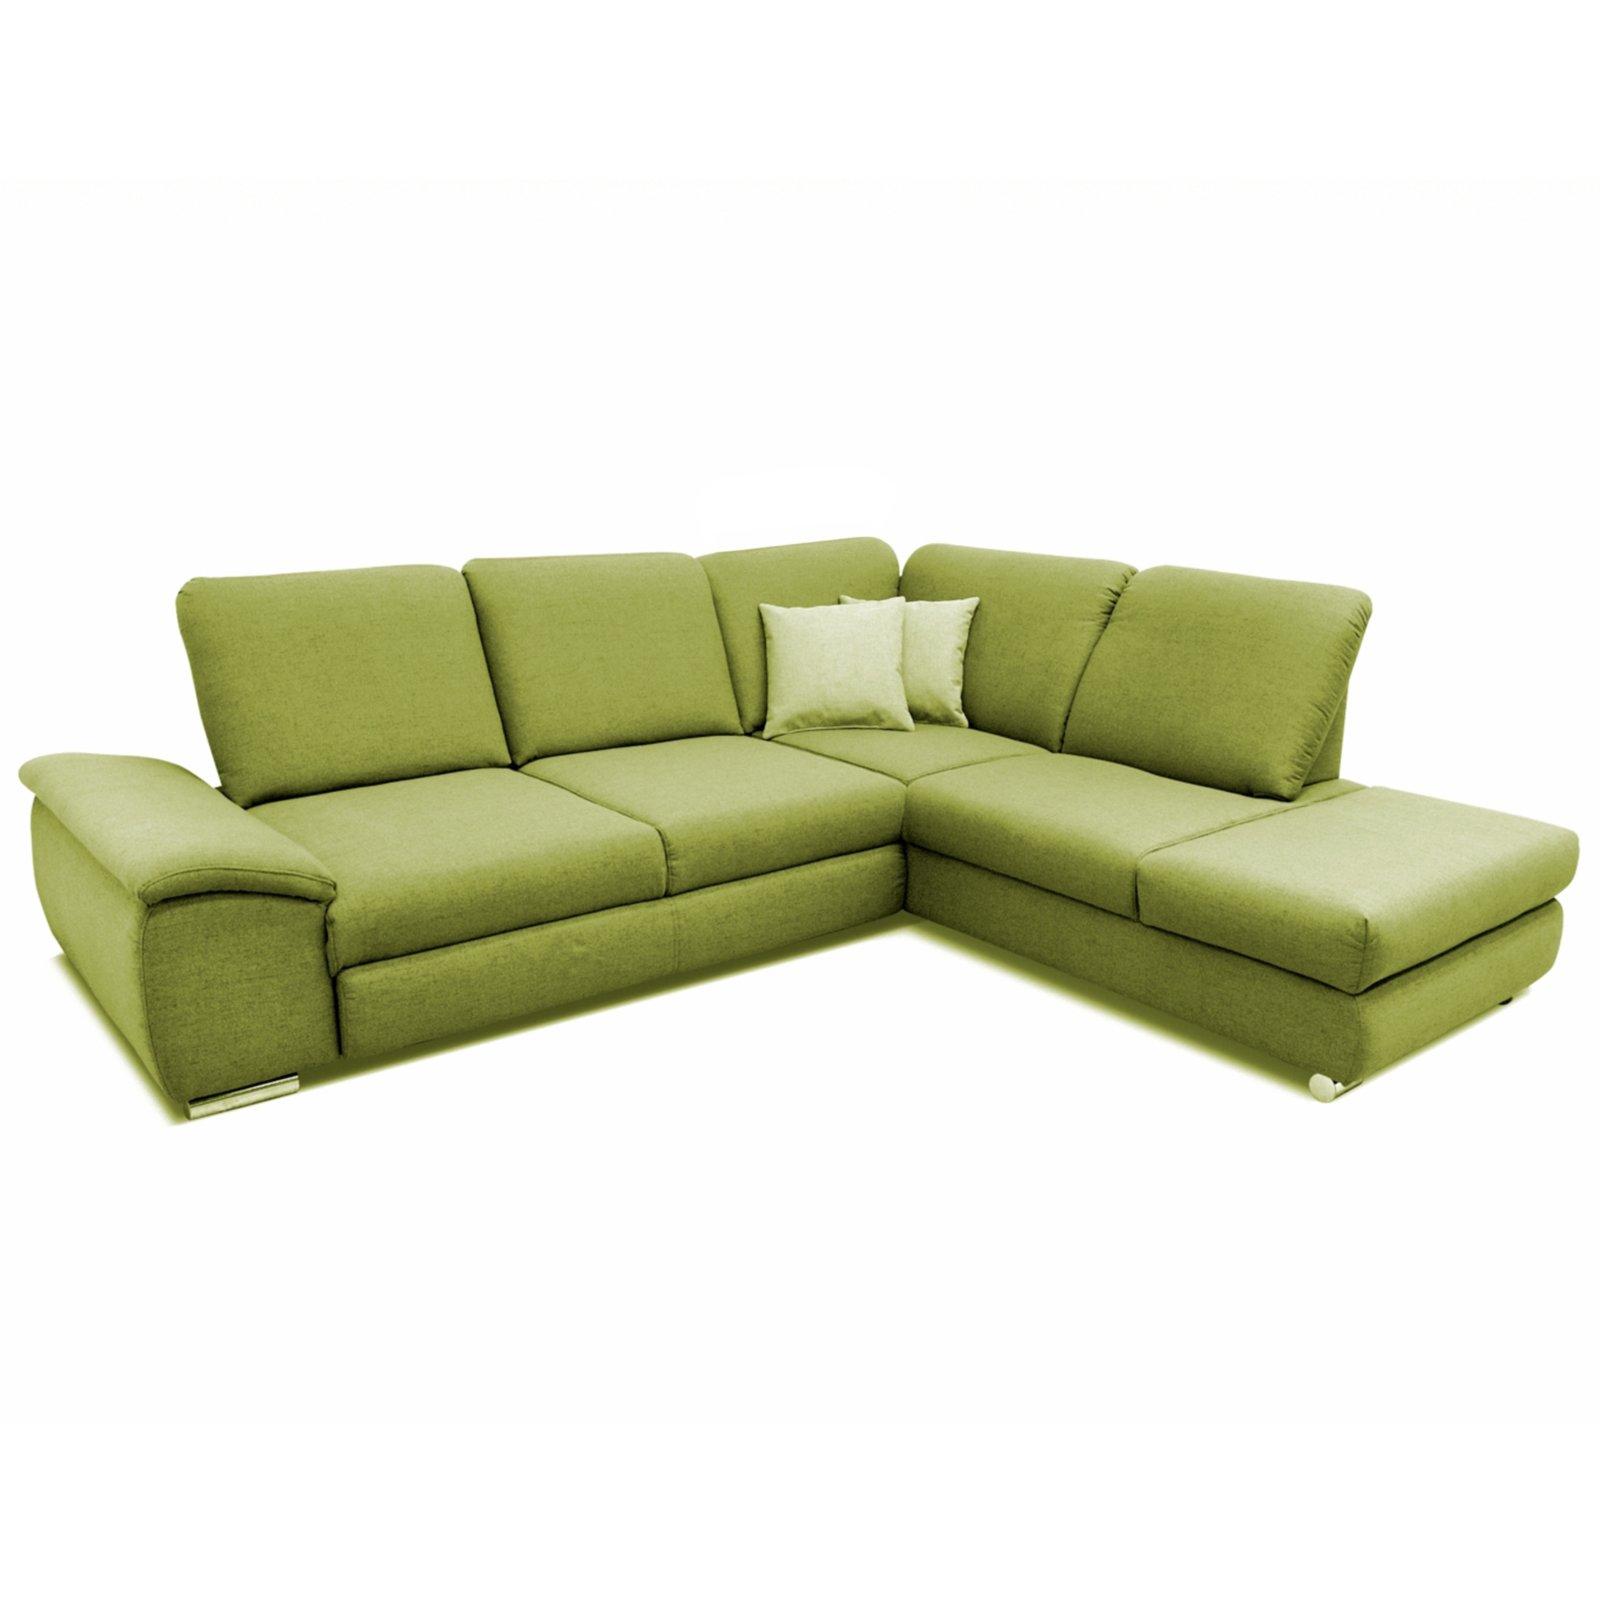 polsterecke gr n sitztiefenverstellung links ecksofas l form sofas couches m bel. Black Bedroom Furniture Sets. Home Design Ideas